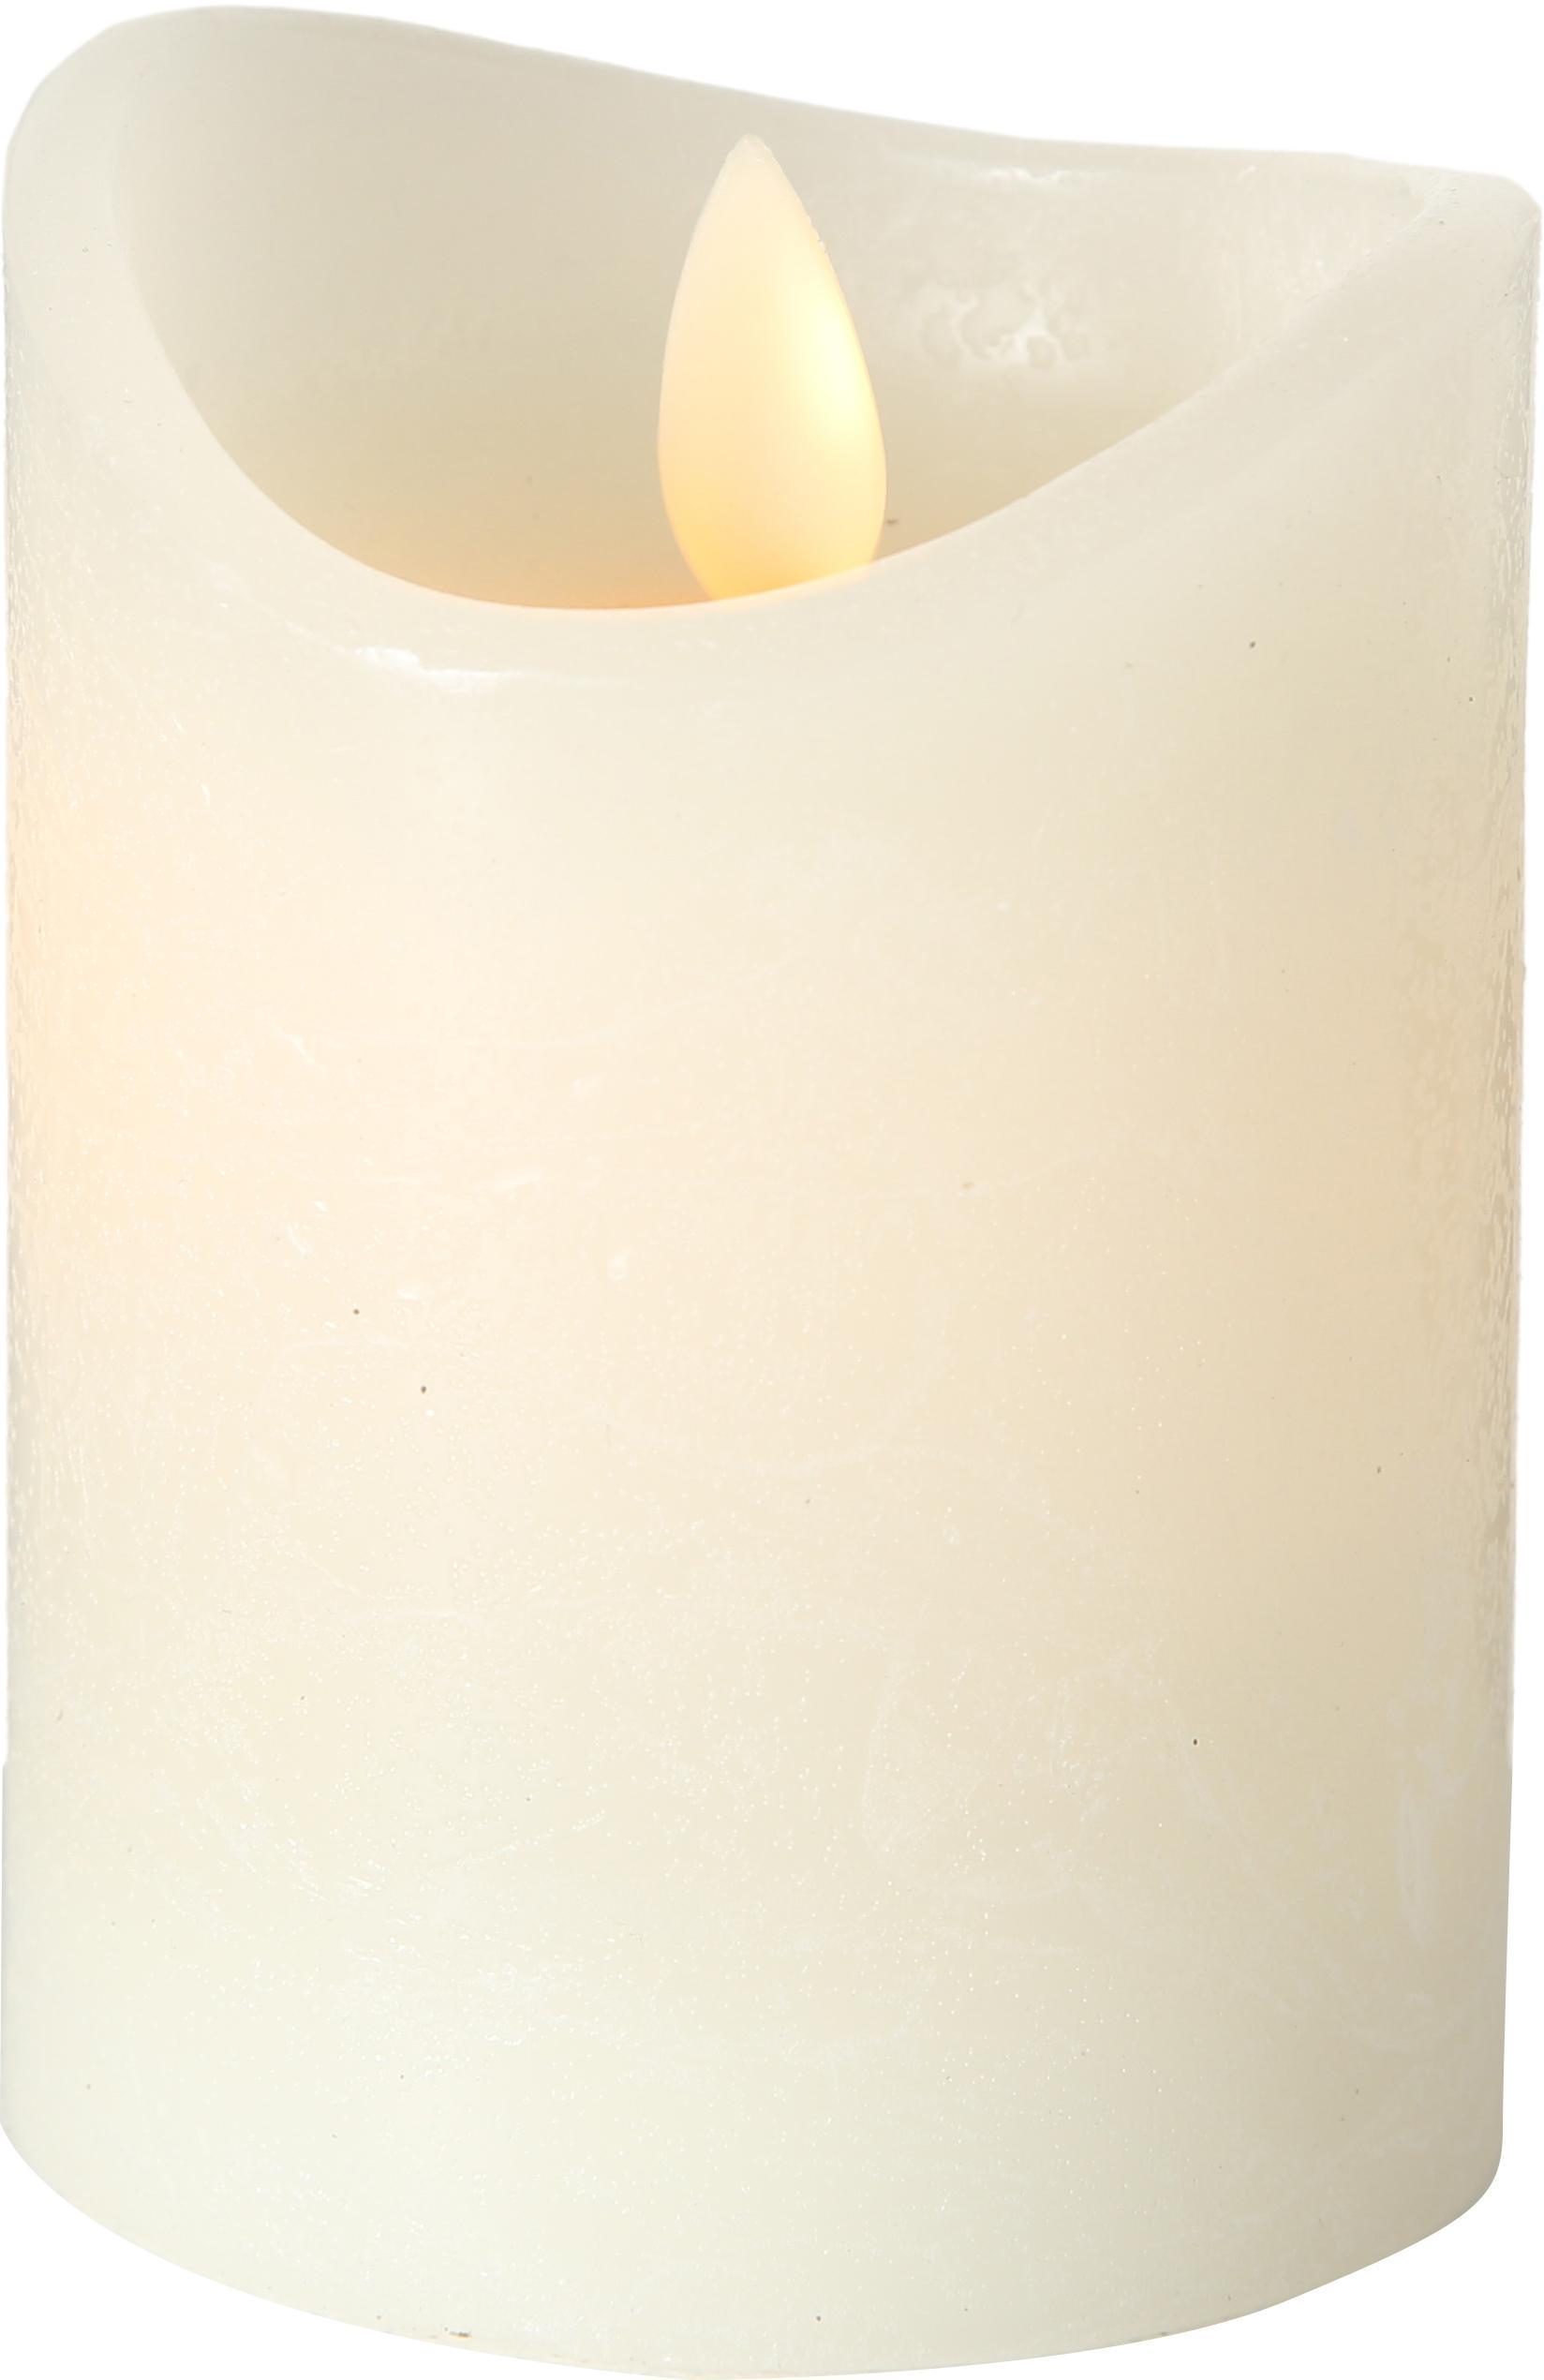 LED kaars Bino, Crèmekleurig, Ø 8 x H 10 cm